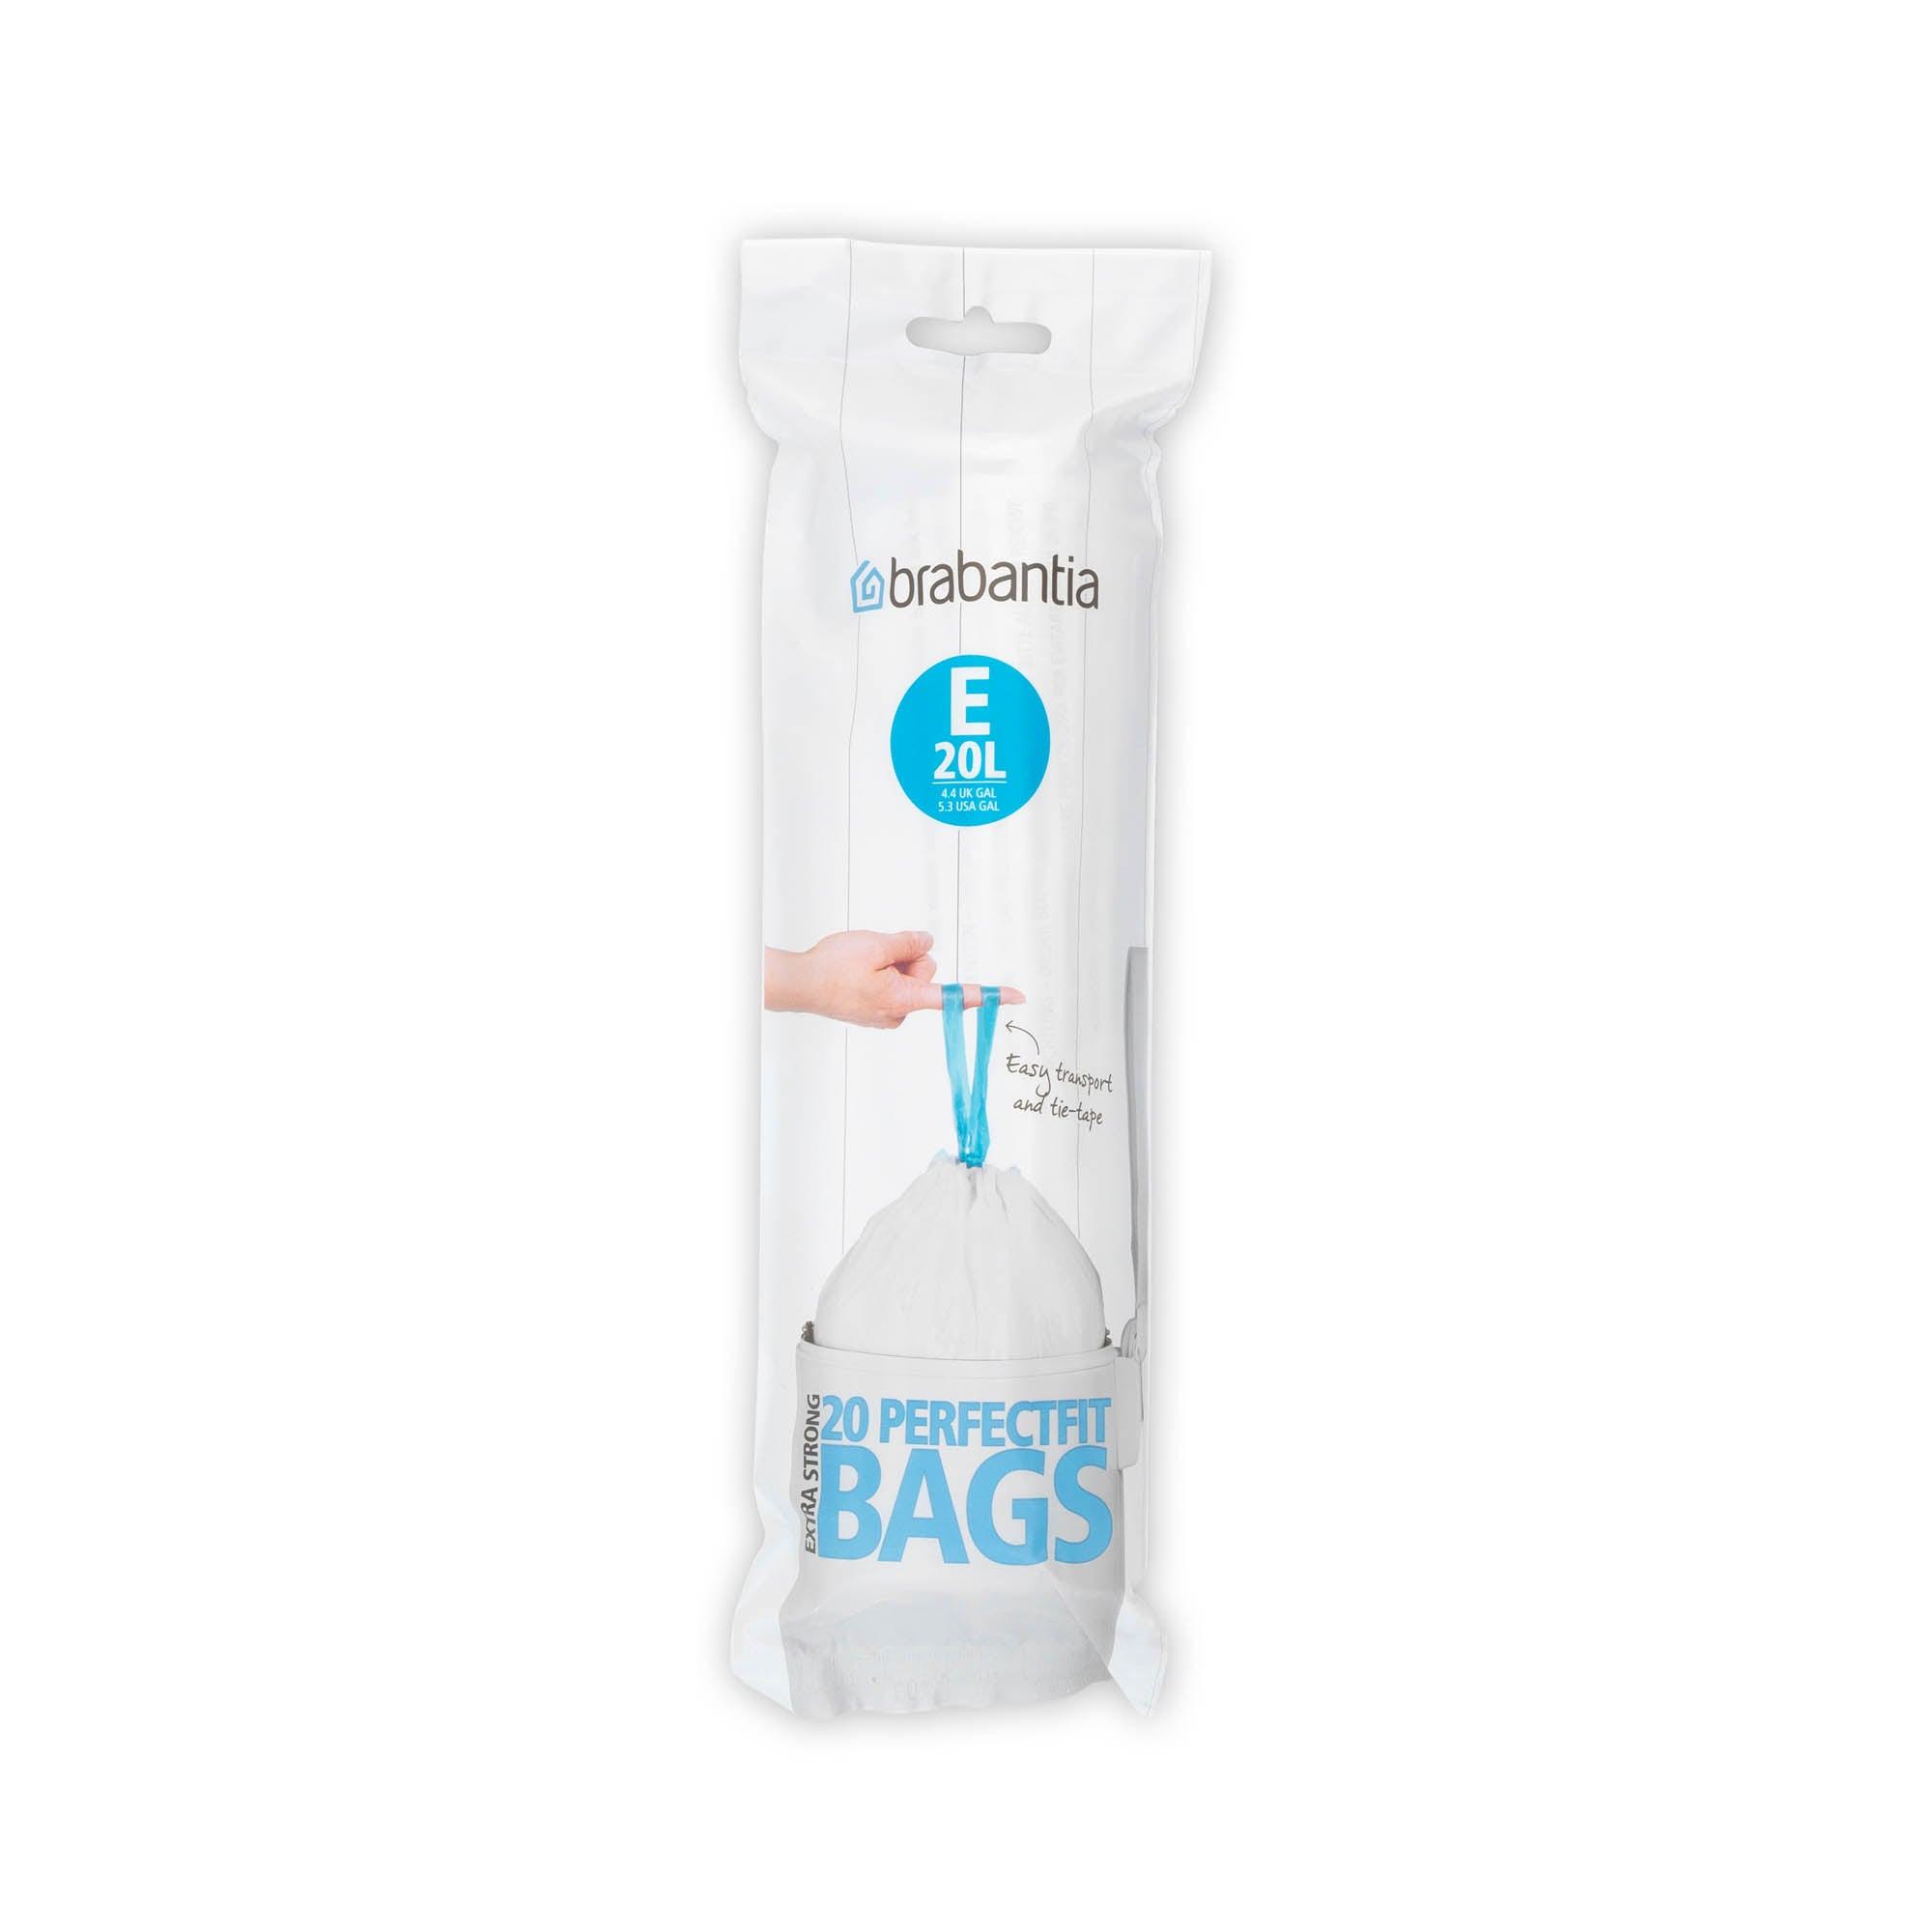 Brabantia 20 Litre Waste Bags